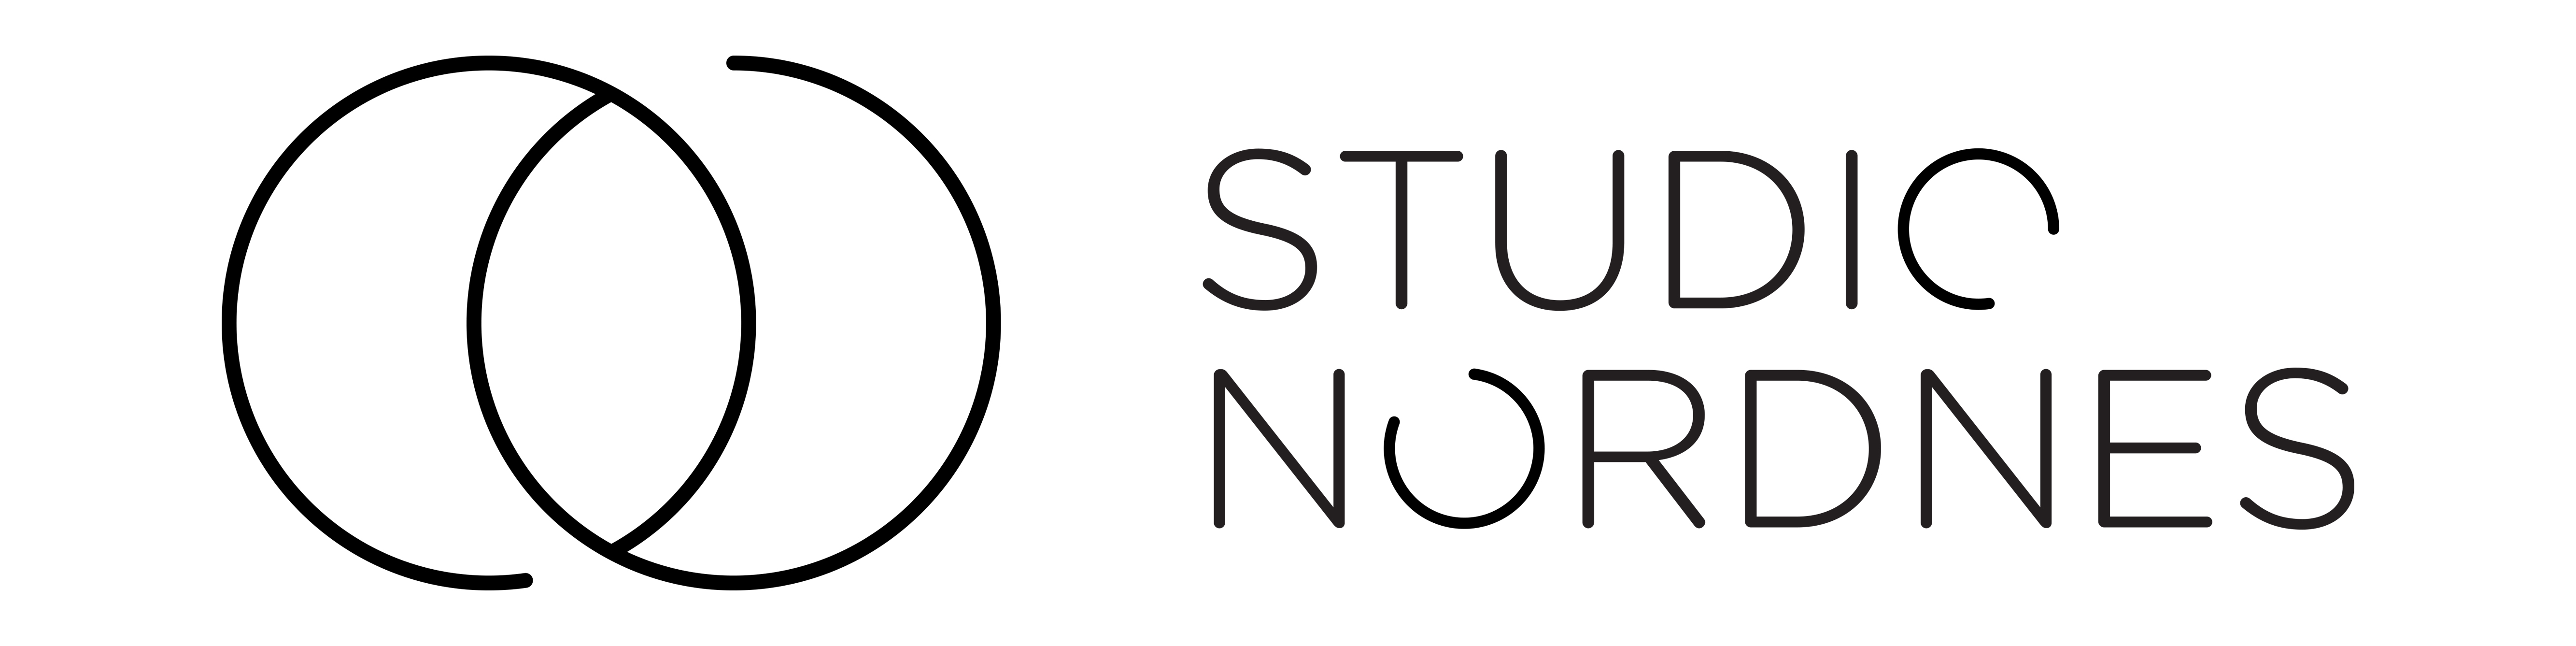 Studio Nordnes logo